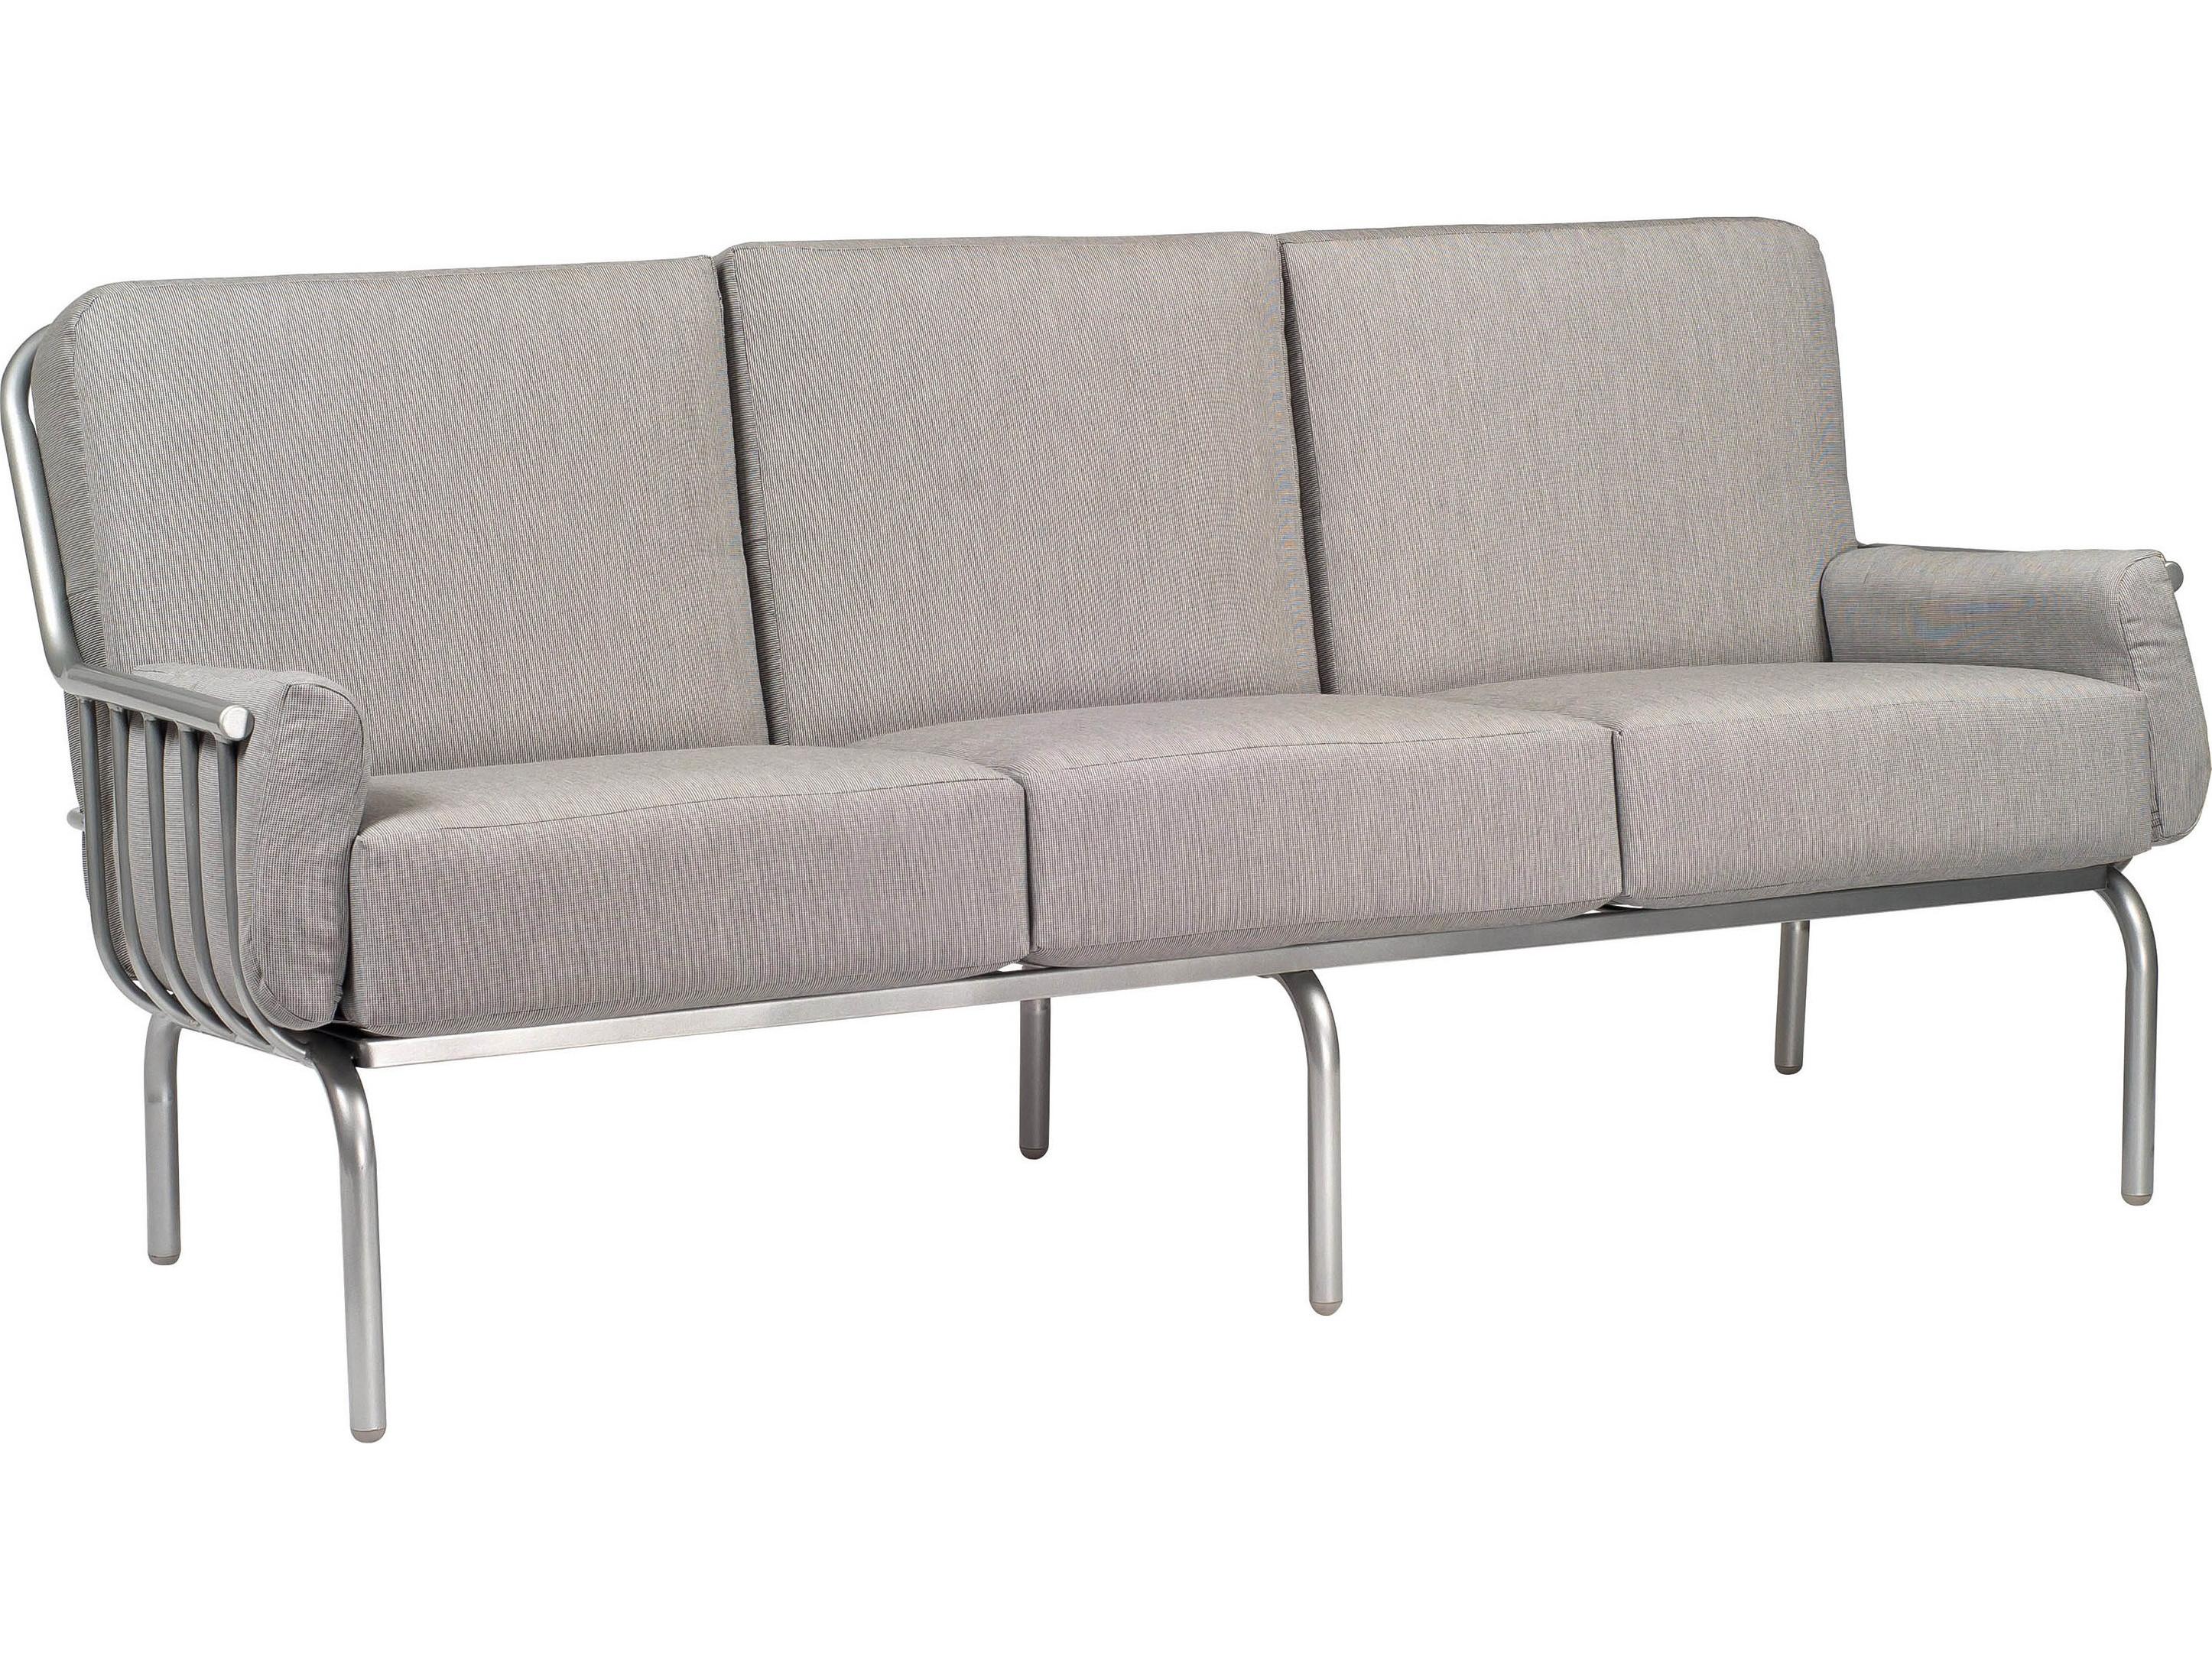 Woodard Uptown Wrought Iron Sofa 2h0020